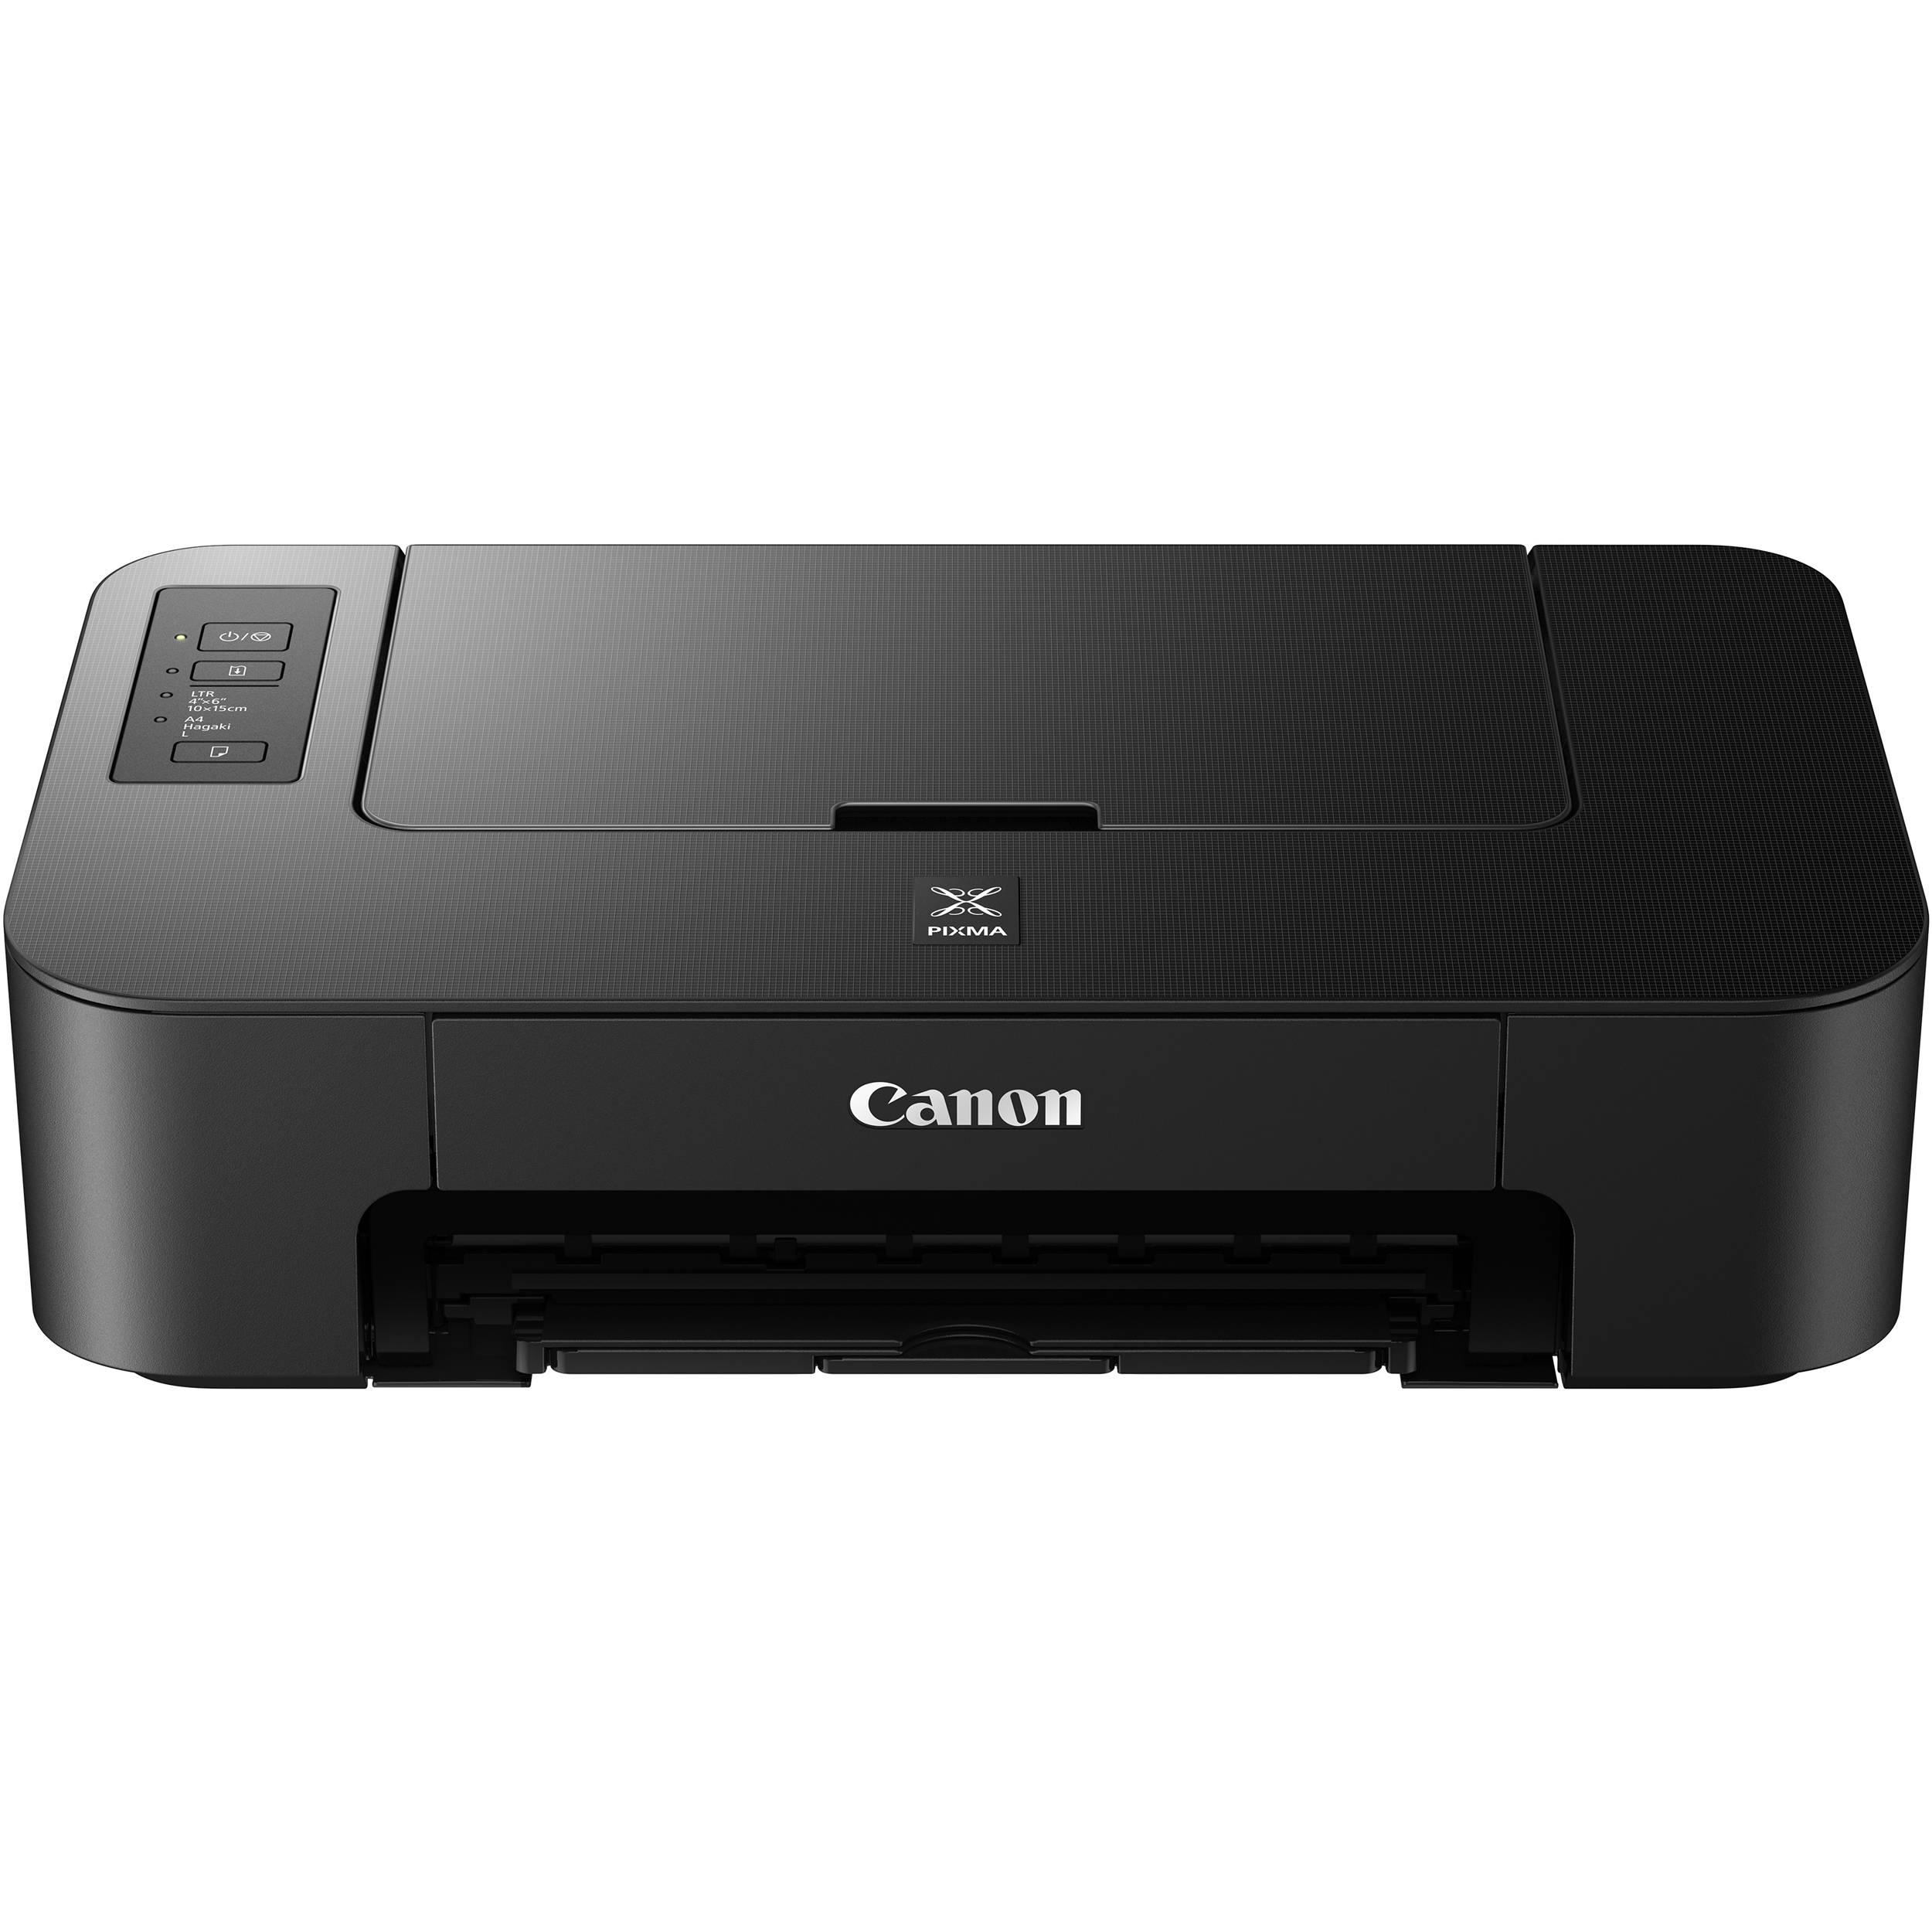 Canon PIXMA TS202 Inkjet Printer 2319C002AA B H Photo Video acd86b46a76f